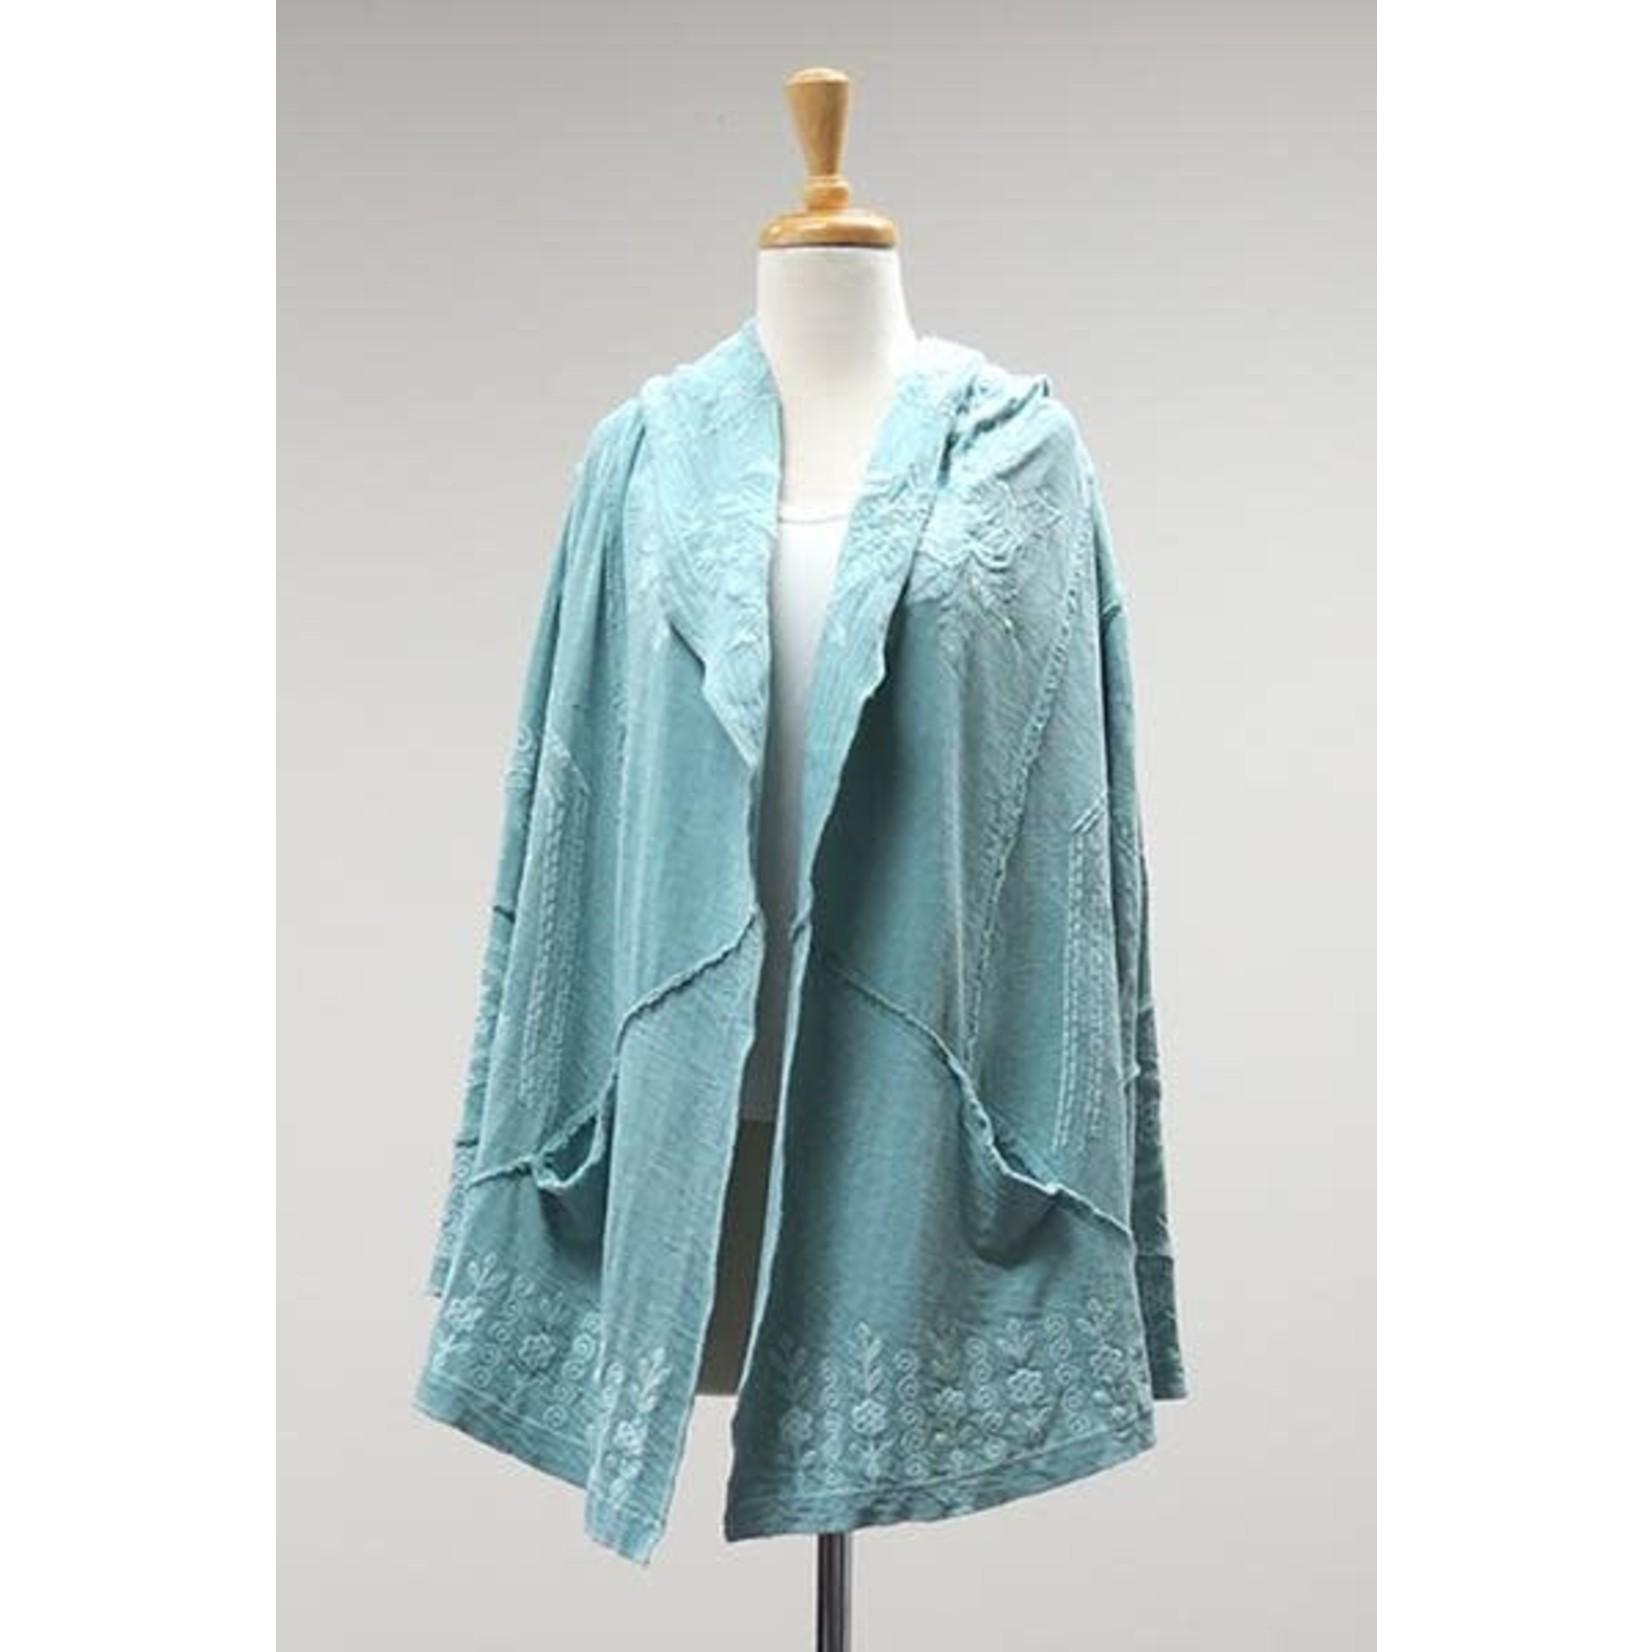 Caite Faded Aqua Embroidered Hooded Cardigan